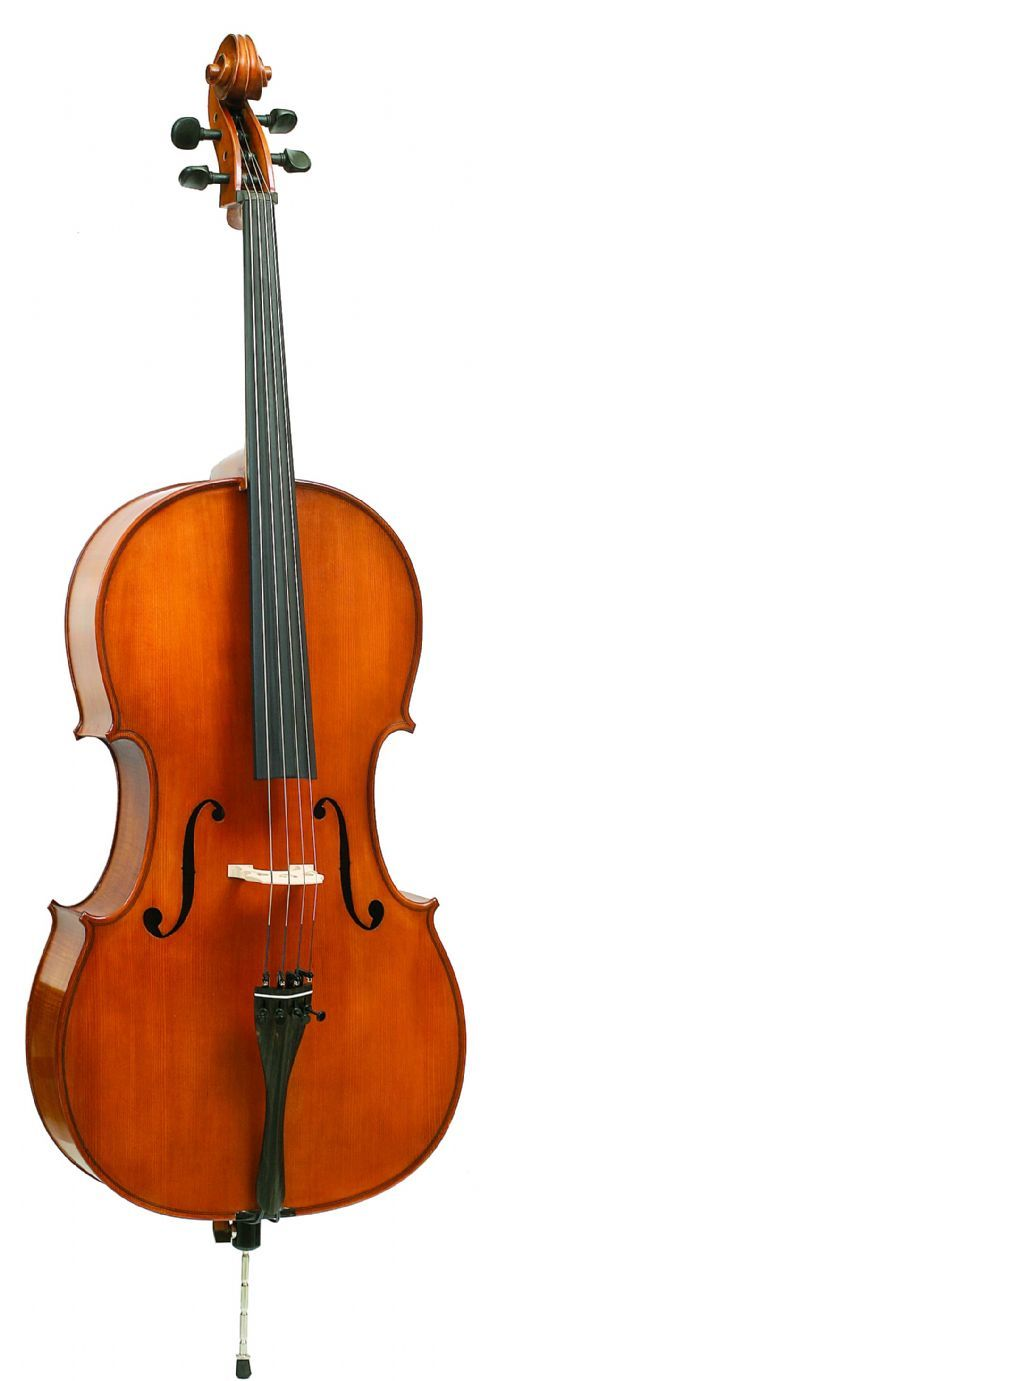 Violonchelo 3/4 GLIGA modelo GENIAL I Antiqued